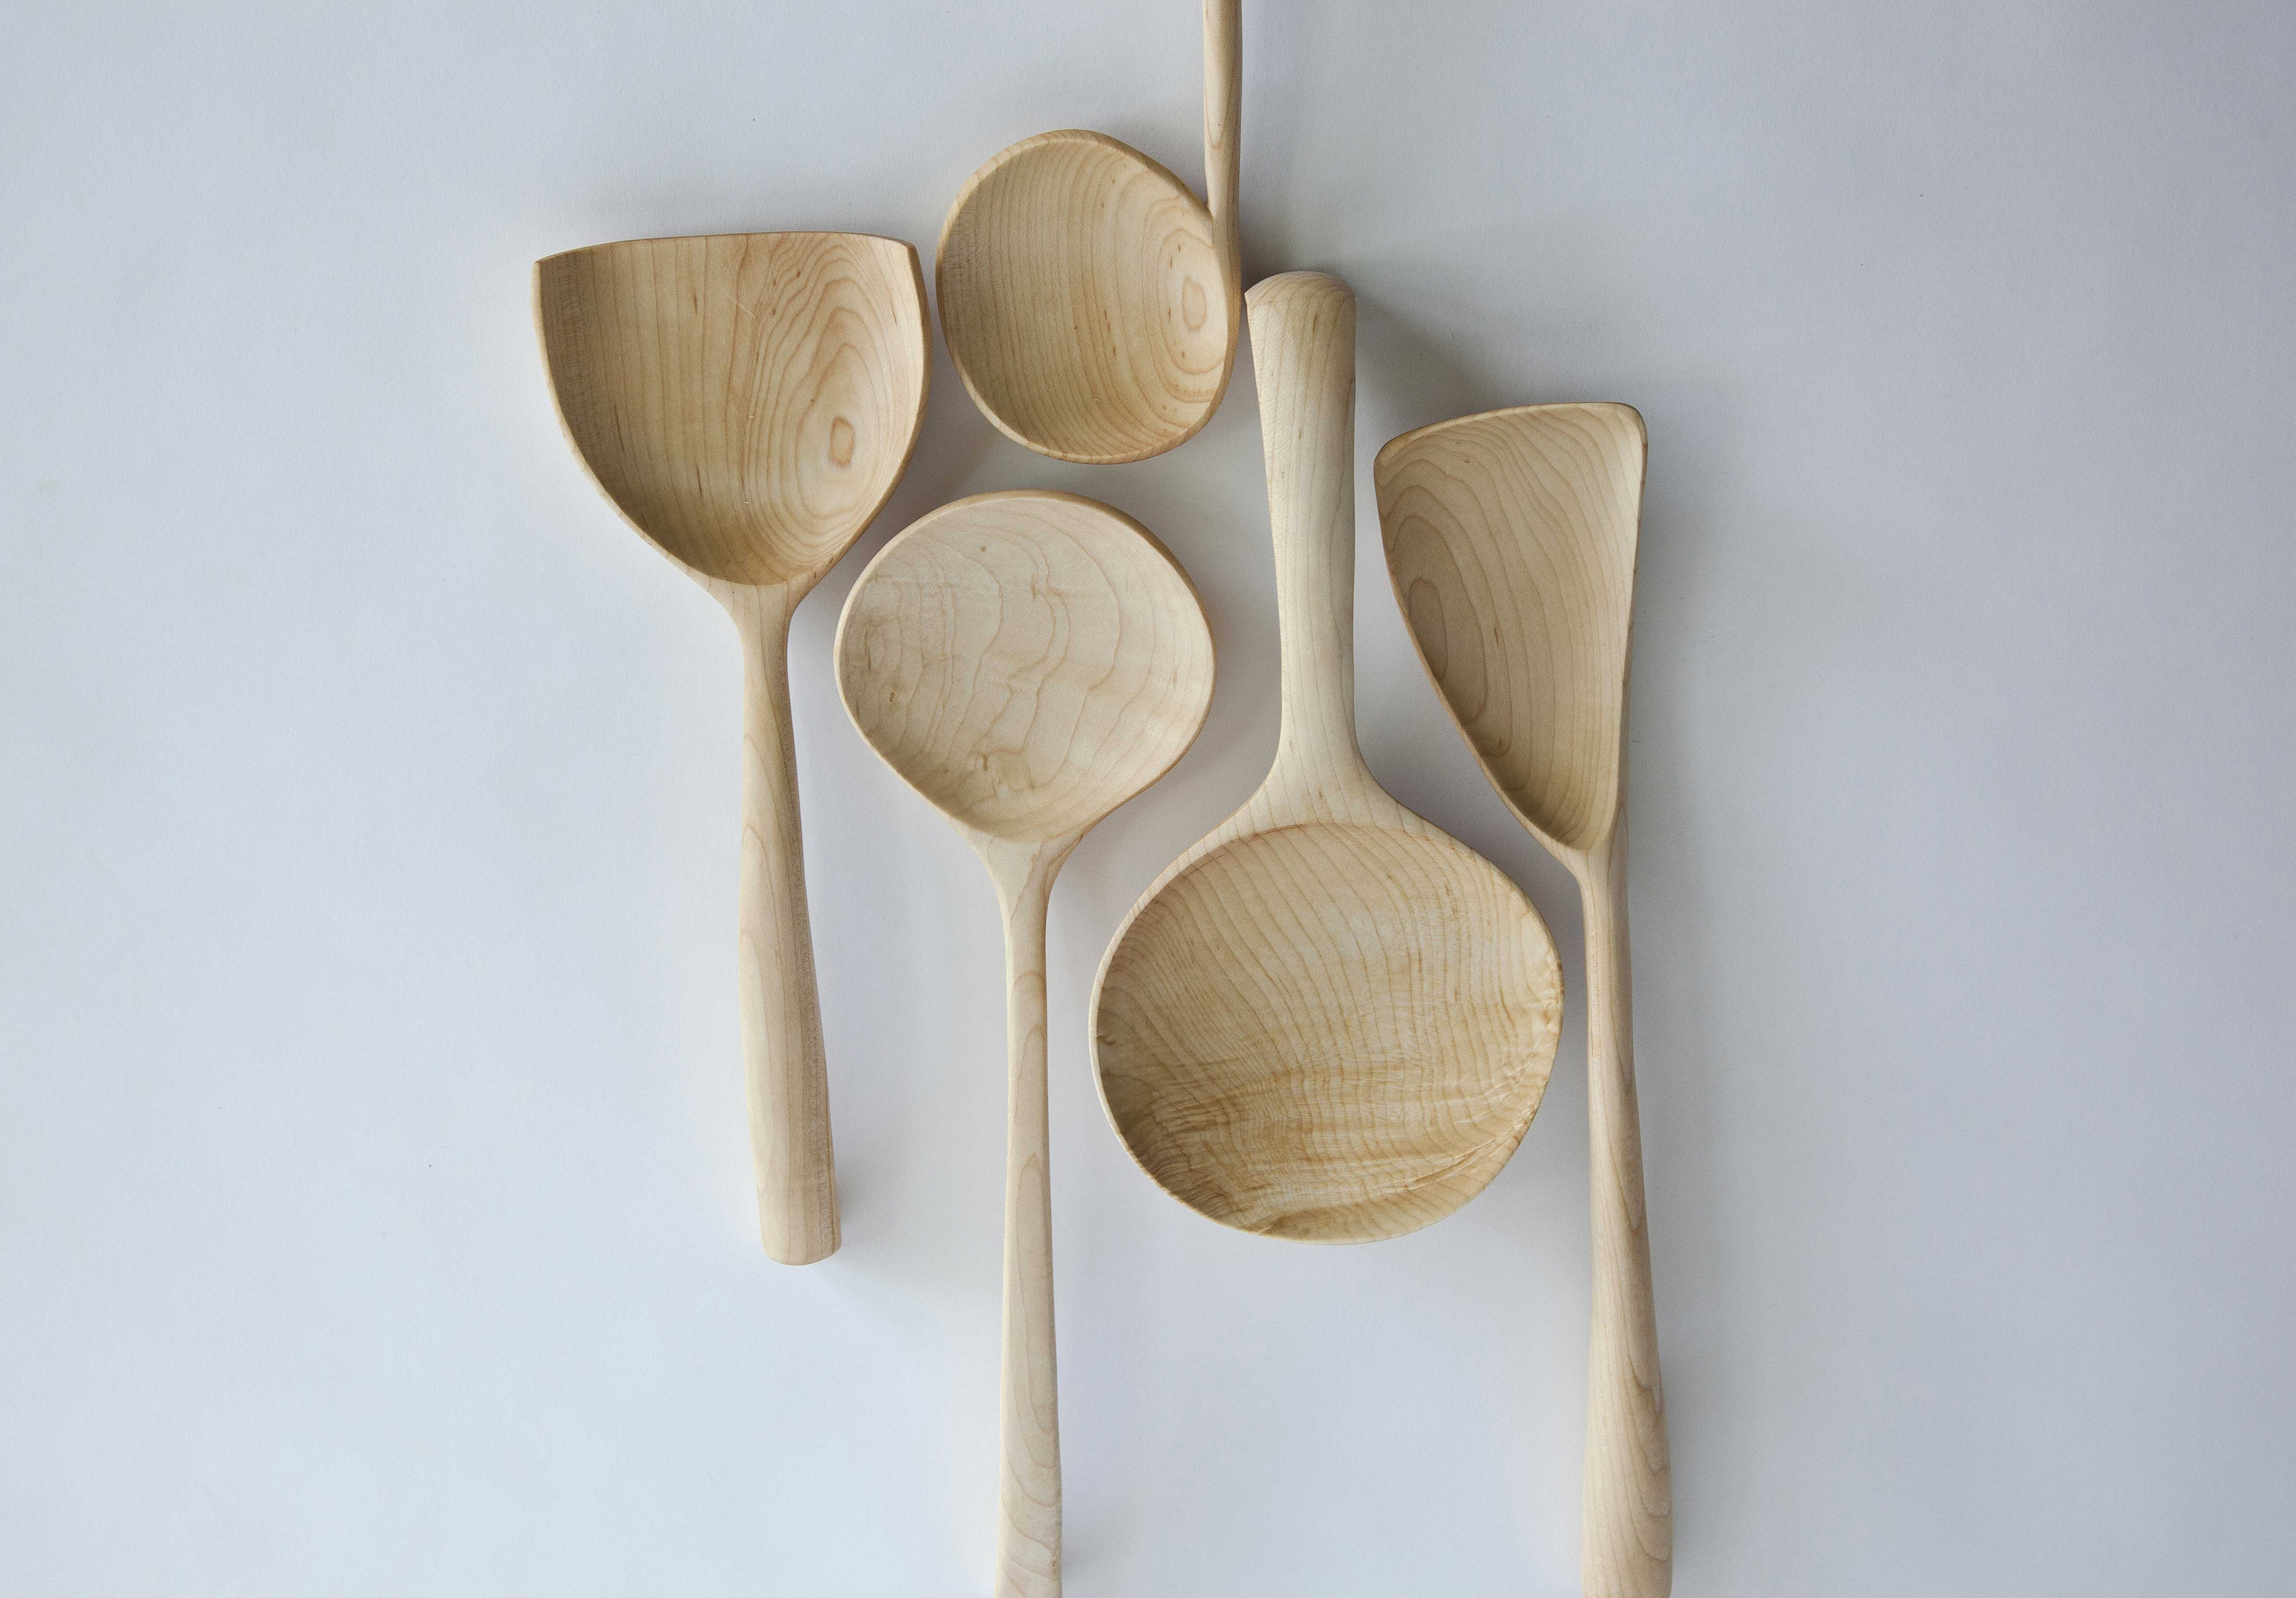 a6_wood_manufactured_joshua_vogel